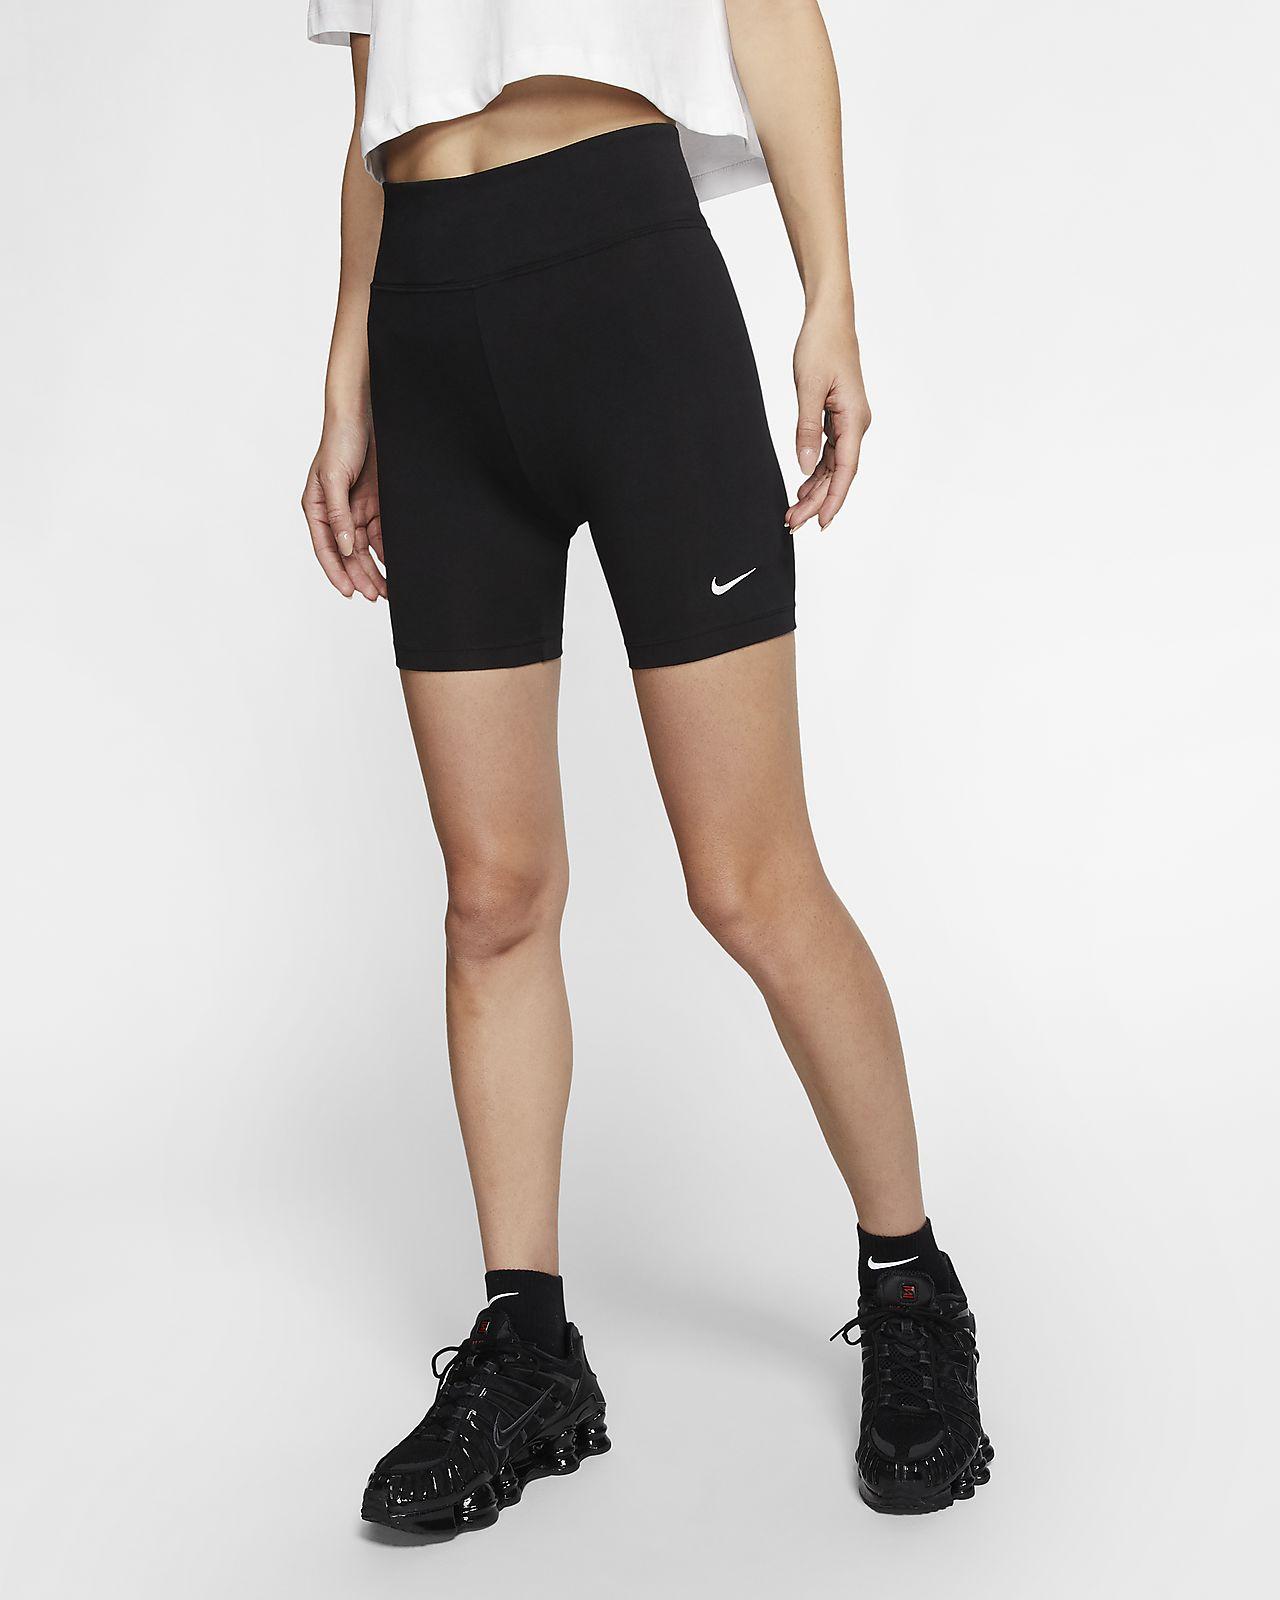 Nike Sportswear Leg-A-See-cykelshorts til kvinder